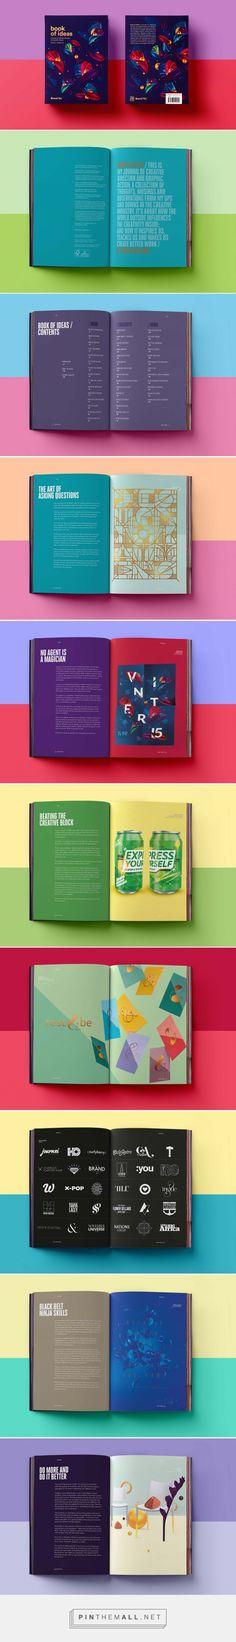 Find Inspiration In Radim Malinic's Book Of Ideas | Webdesigner Depot - created via https://pinthemall.net